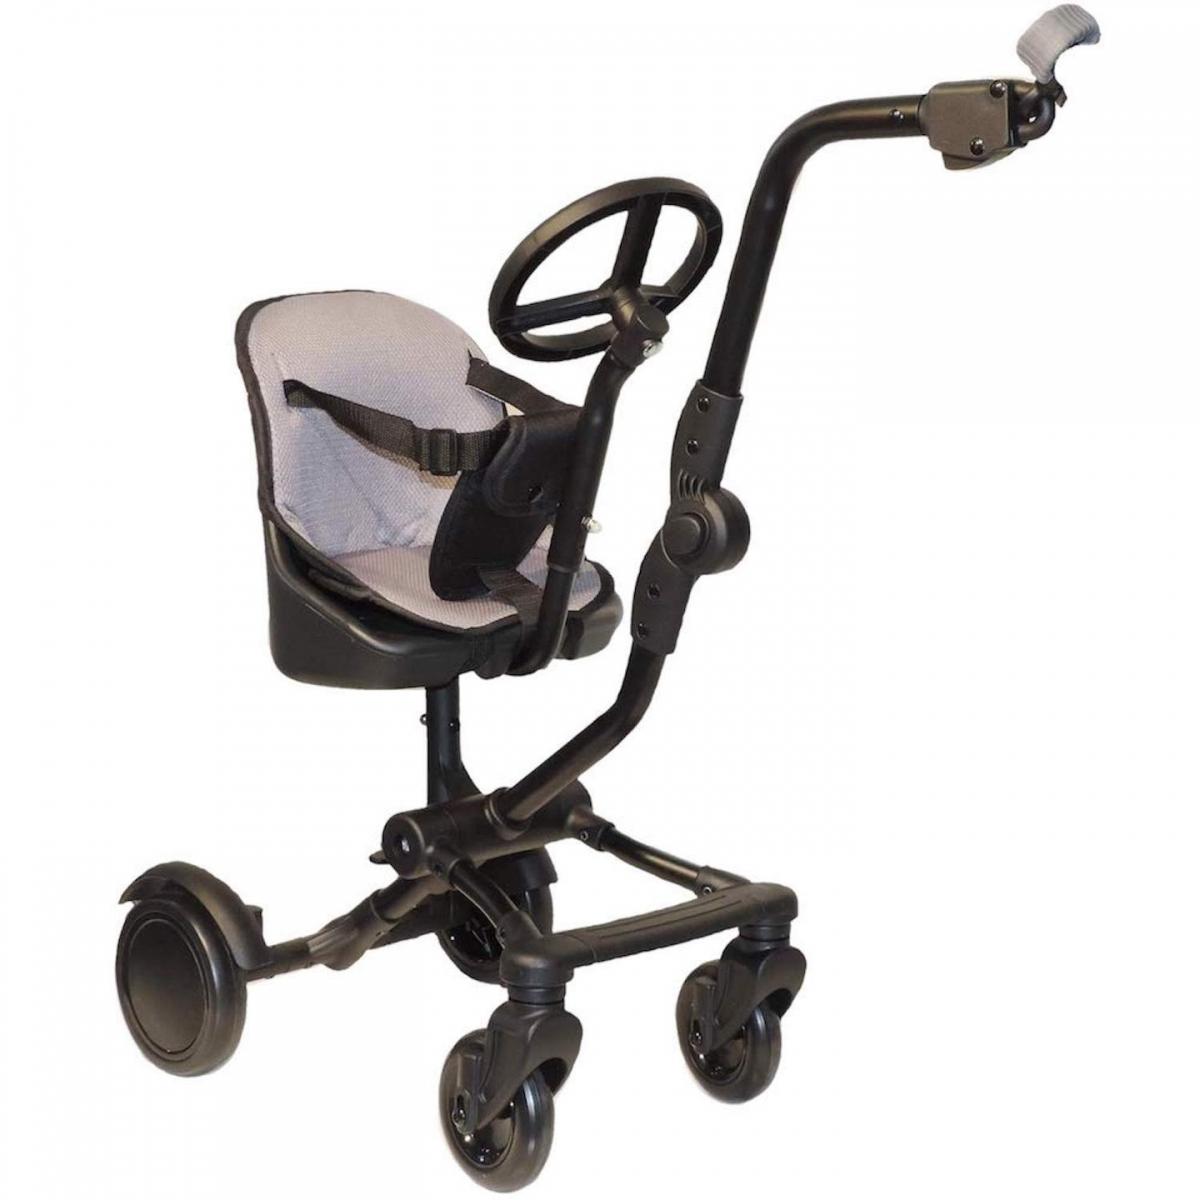 Roma Uptown Rider Toddler Seat (NEW)